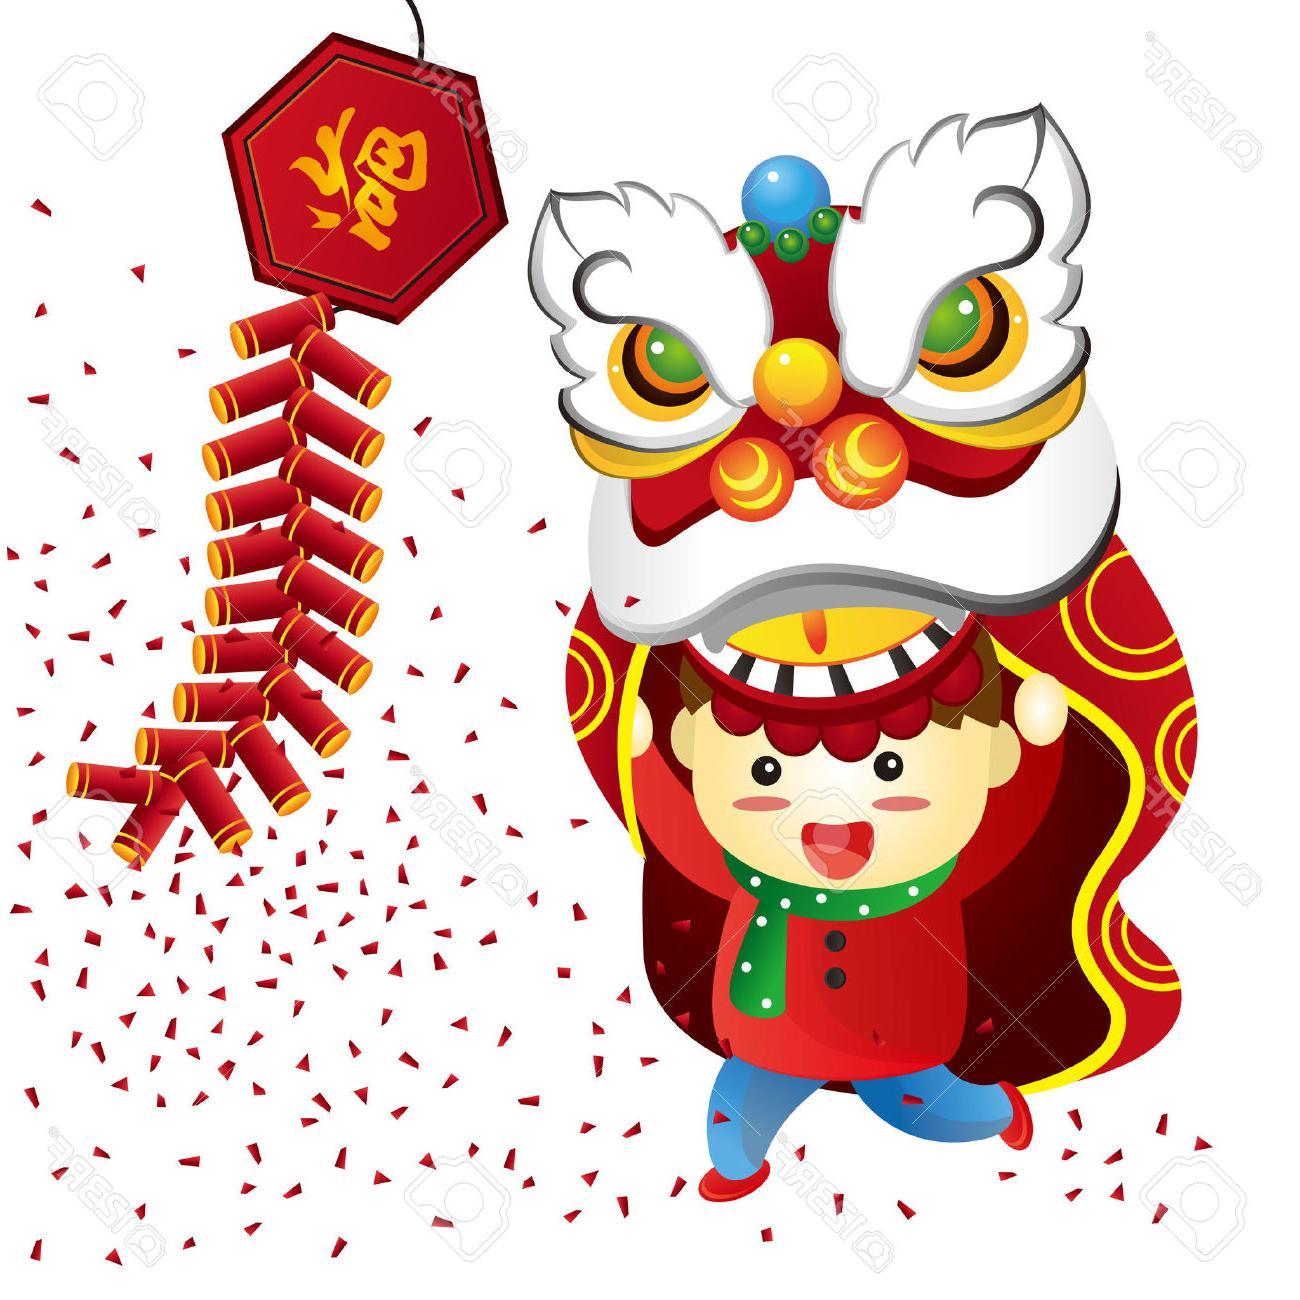 China clipart cartoon. Hd chinese animation lunar